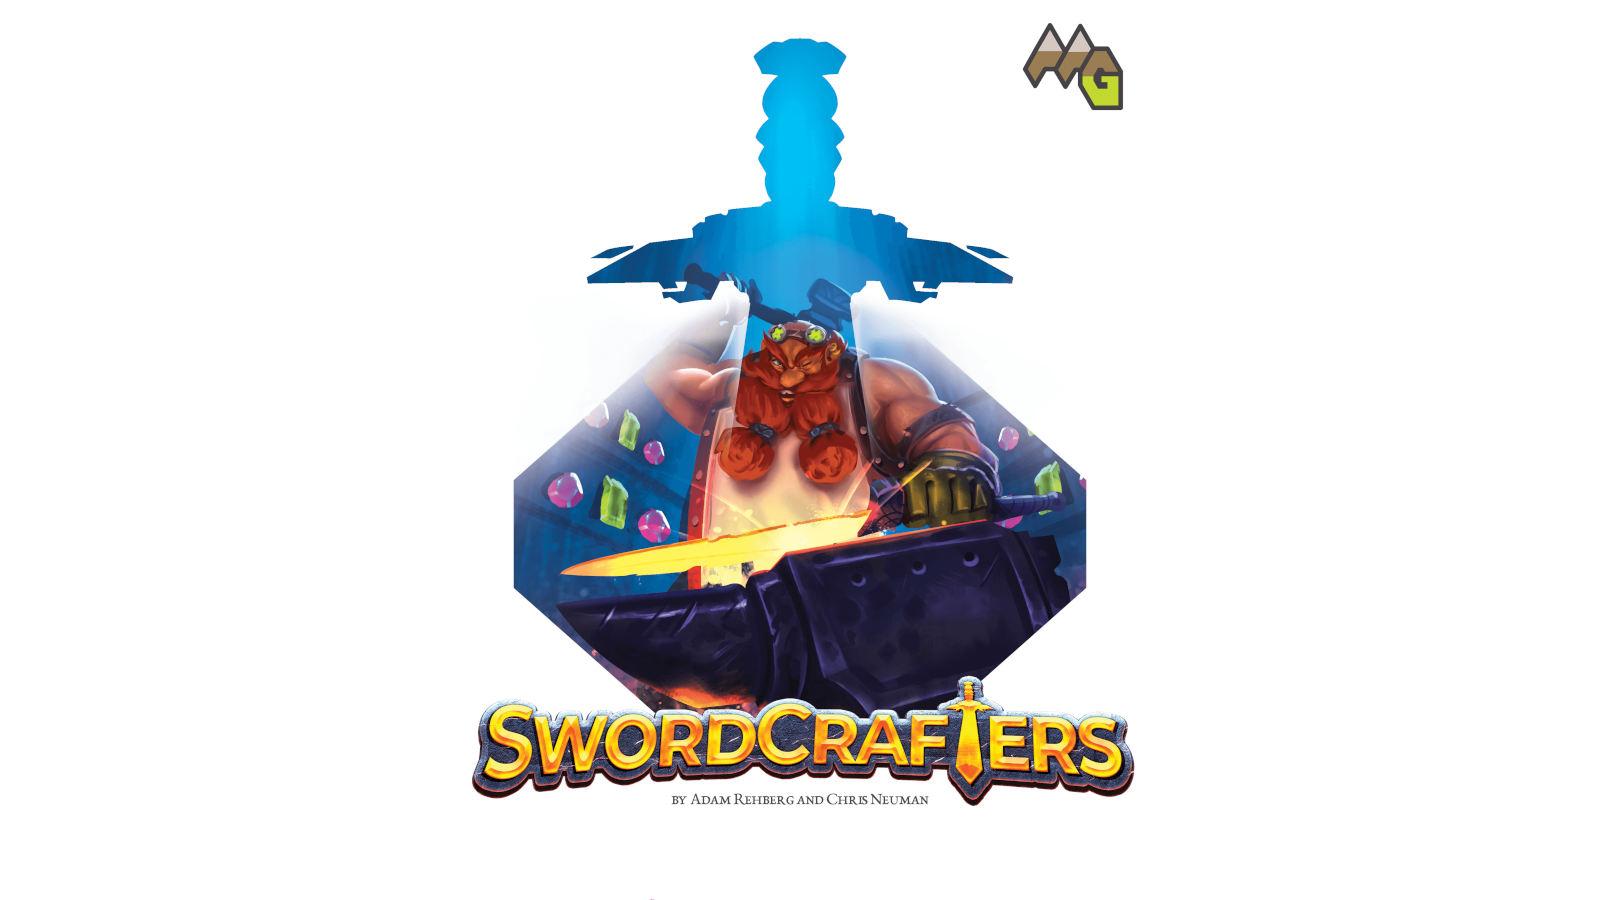 Little Rocket Games annuncia le spade 3D di Swordcrafters: